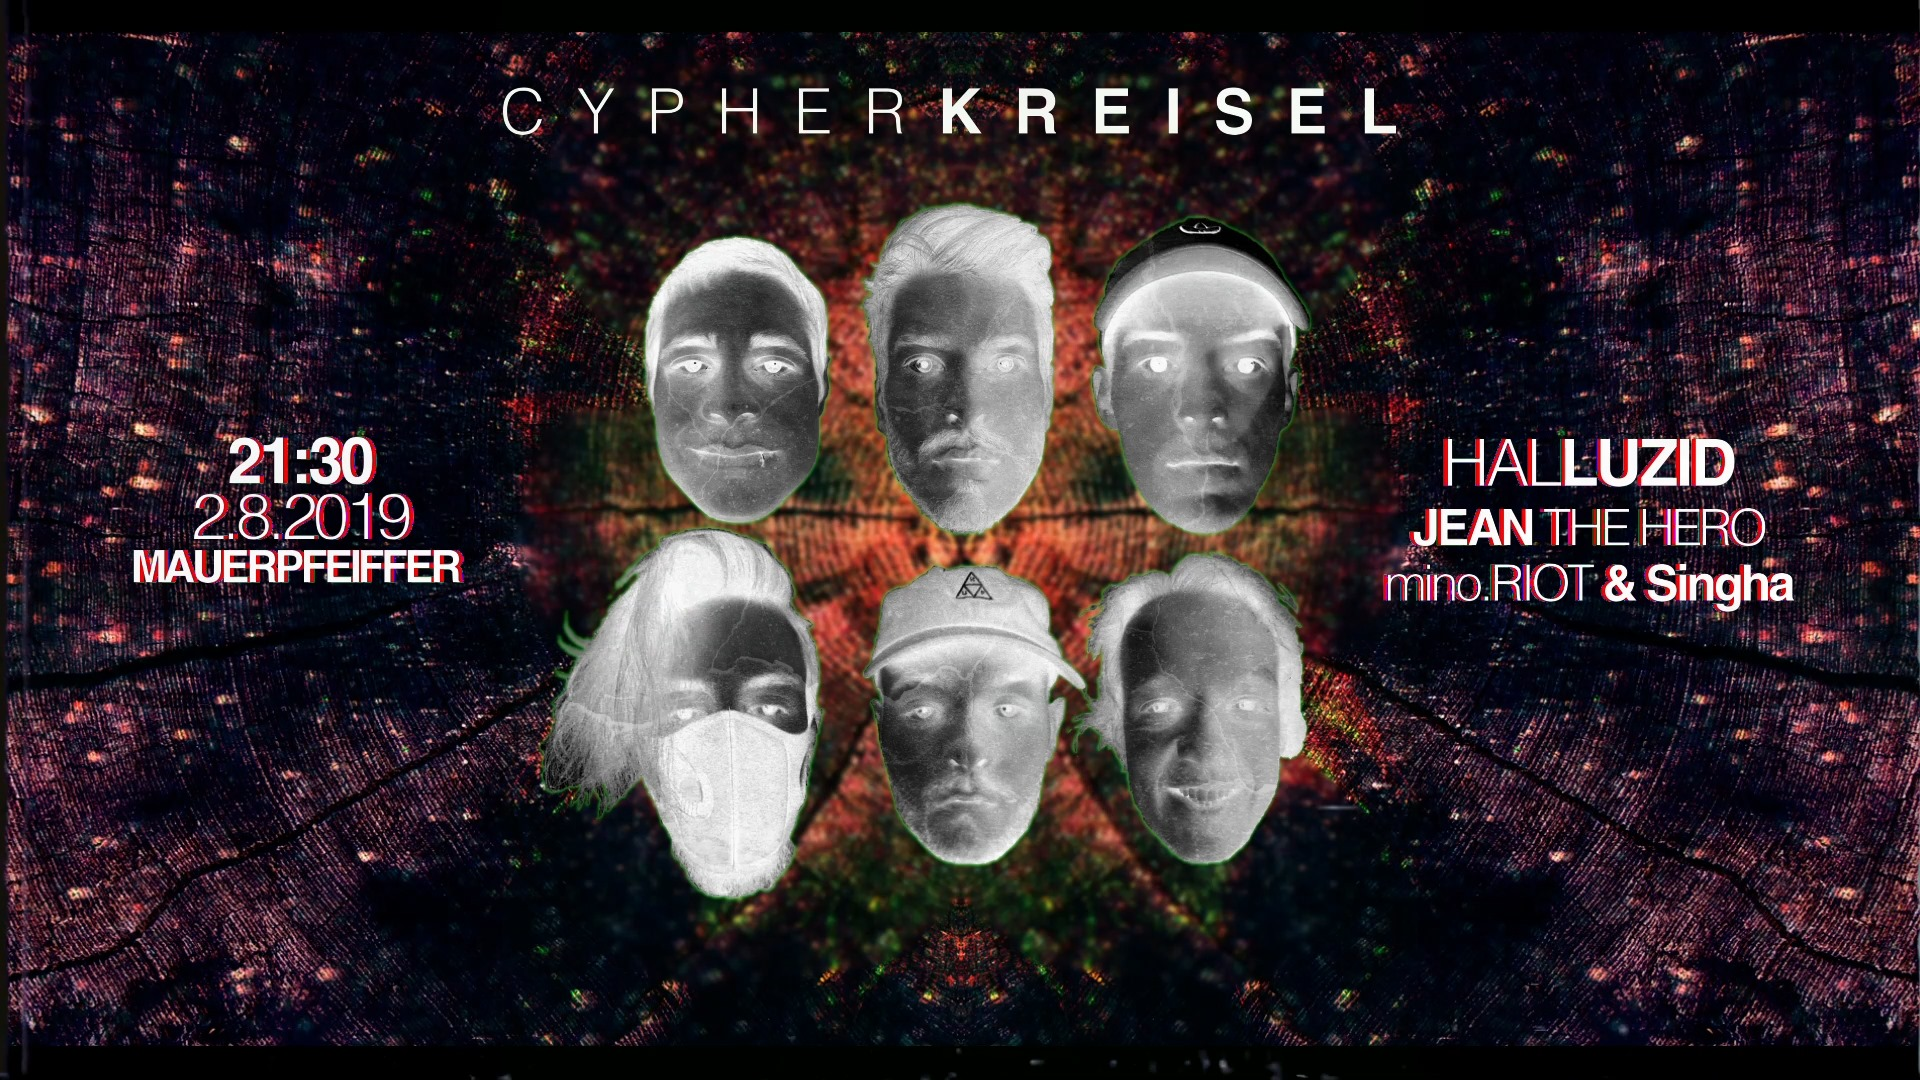 Cypherkreisel#2 w/ Jean The Hero / mino.RIOT & Singha / Halluzid